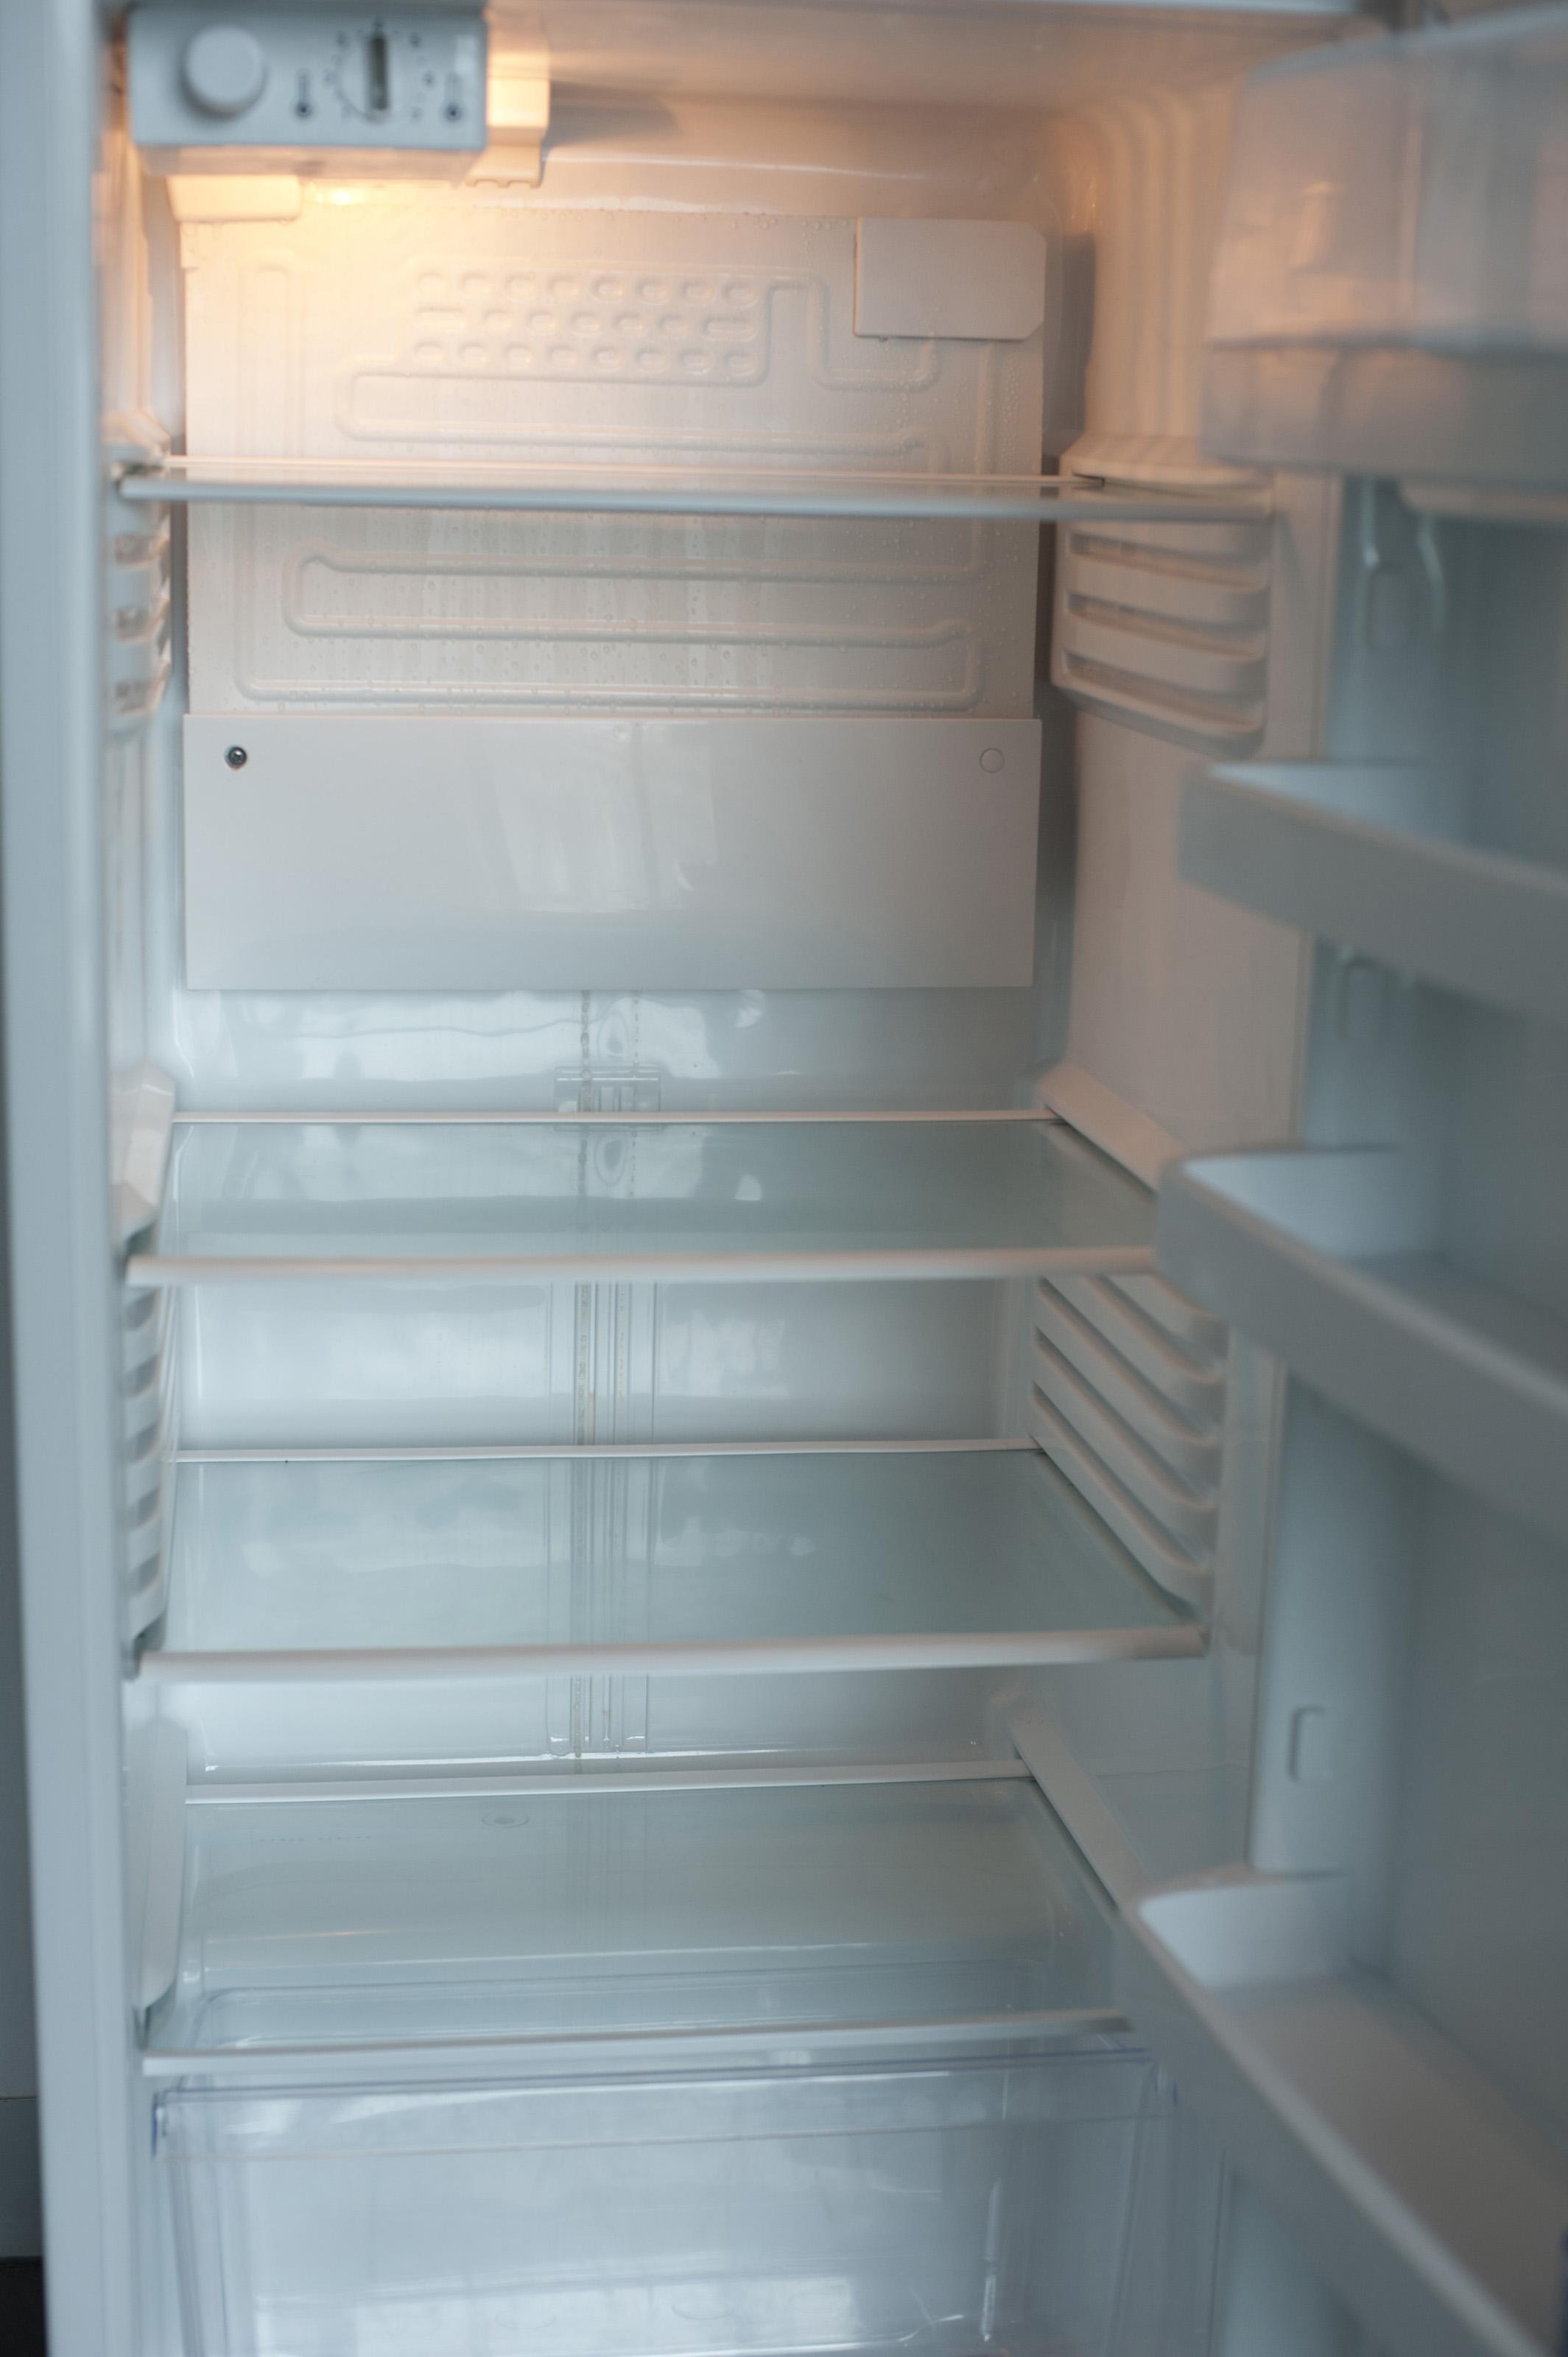 Free Stock Photo 10651 Open Empty Refrigerator